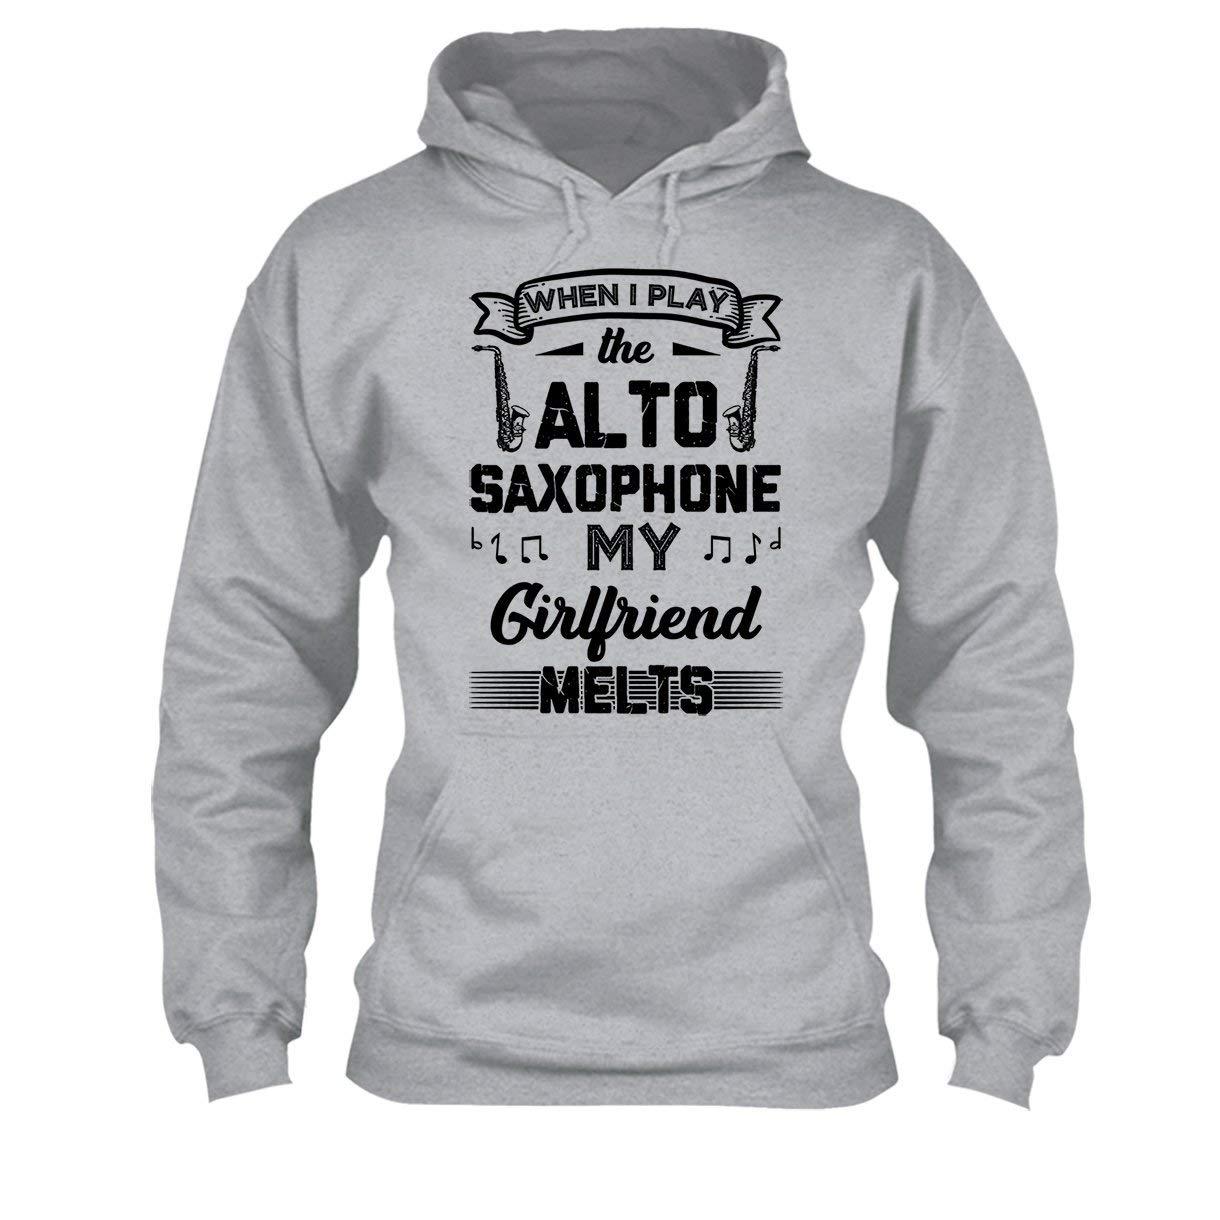 Hoodie I Play The Alto Saxophone Tee Shirt Cool Sweatshirt